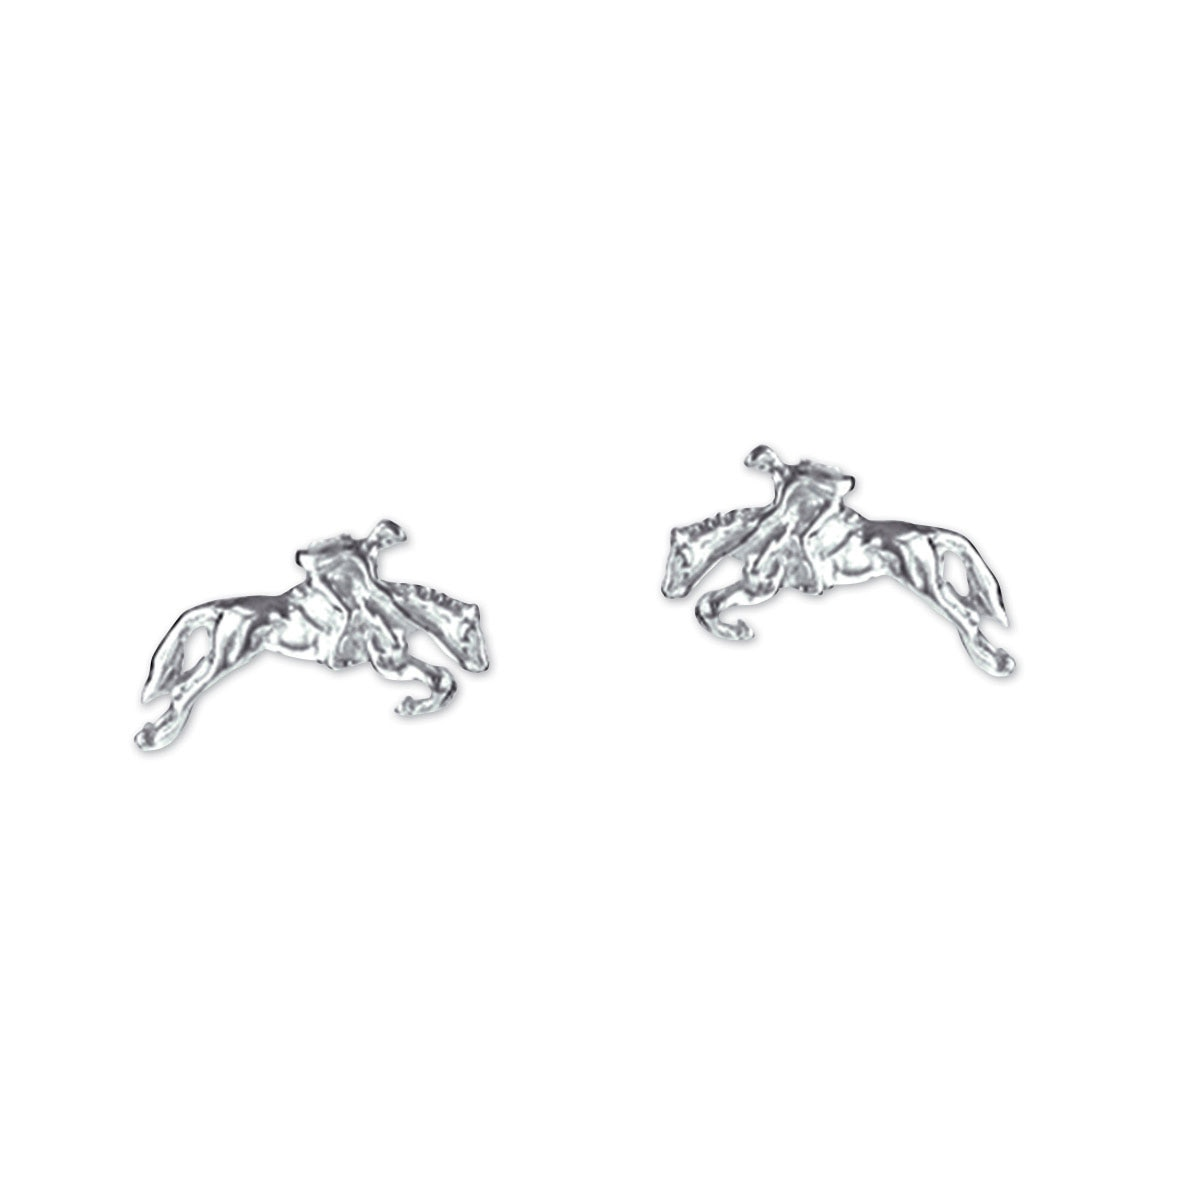 Tiny Jumper Horse & Rider Earrings